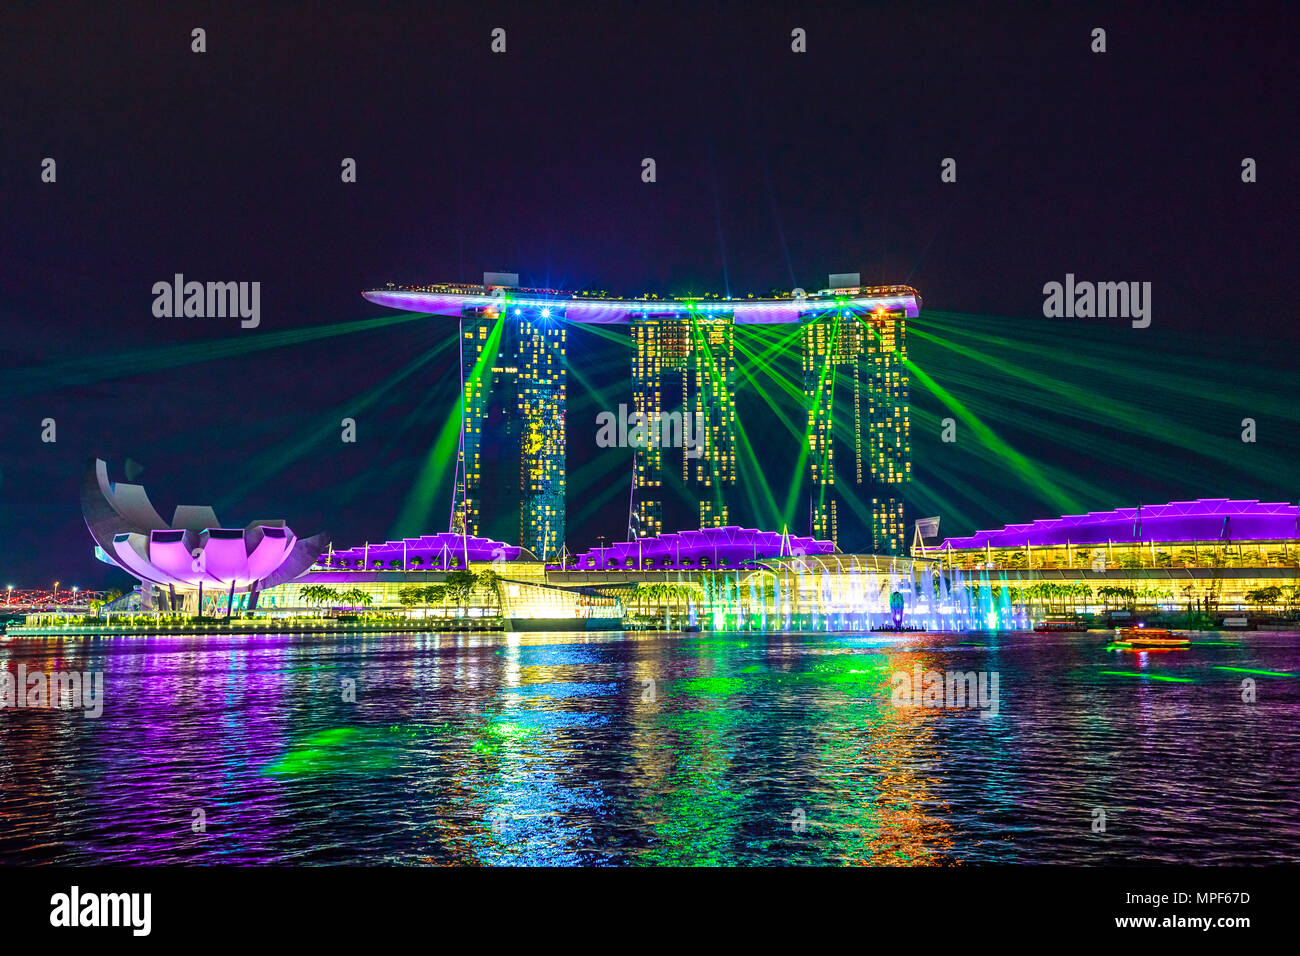 singapore april 27 2018 great laser show at night time at marina